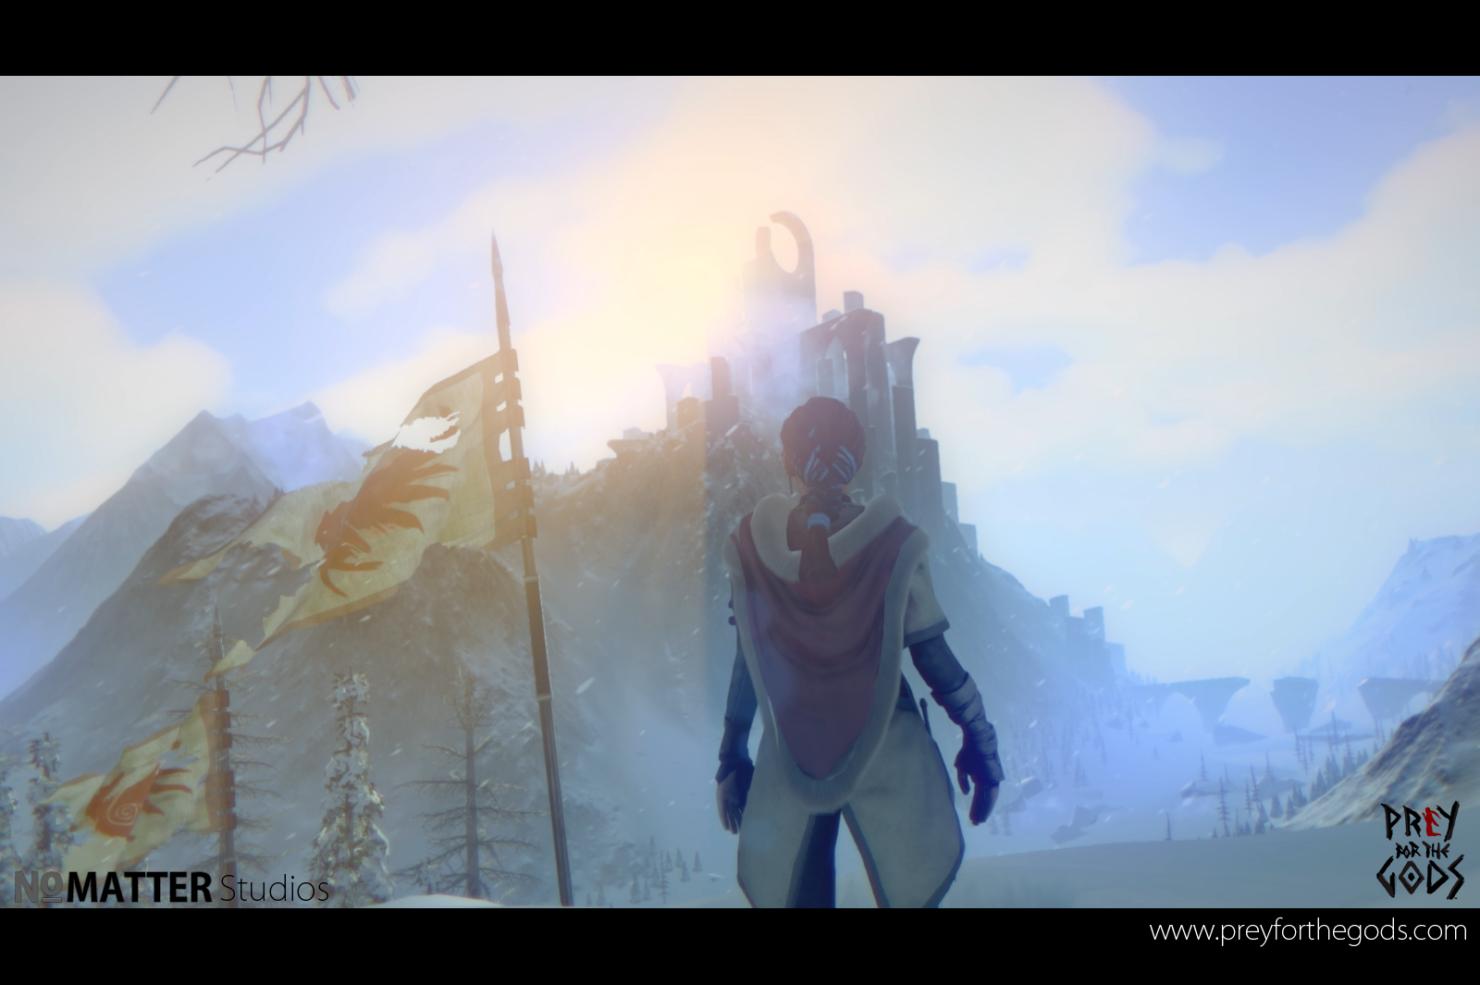 prey-for-the-gods-3